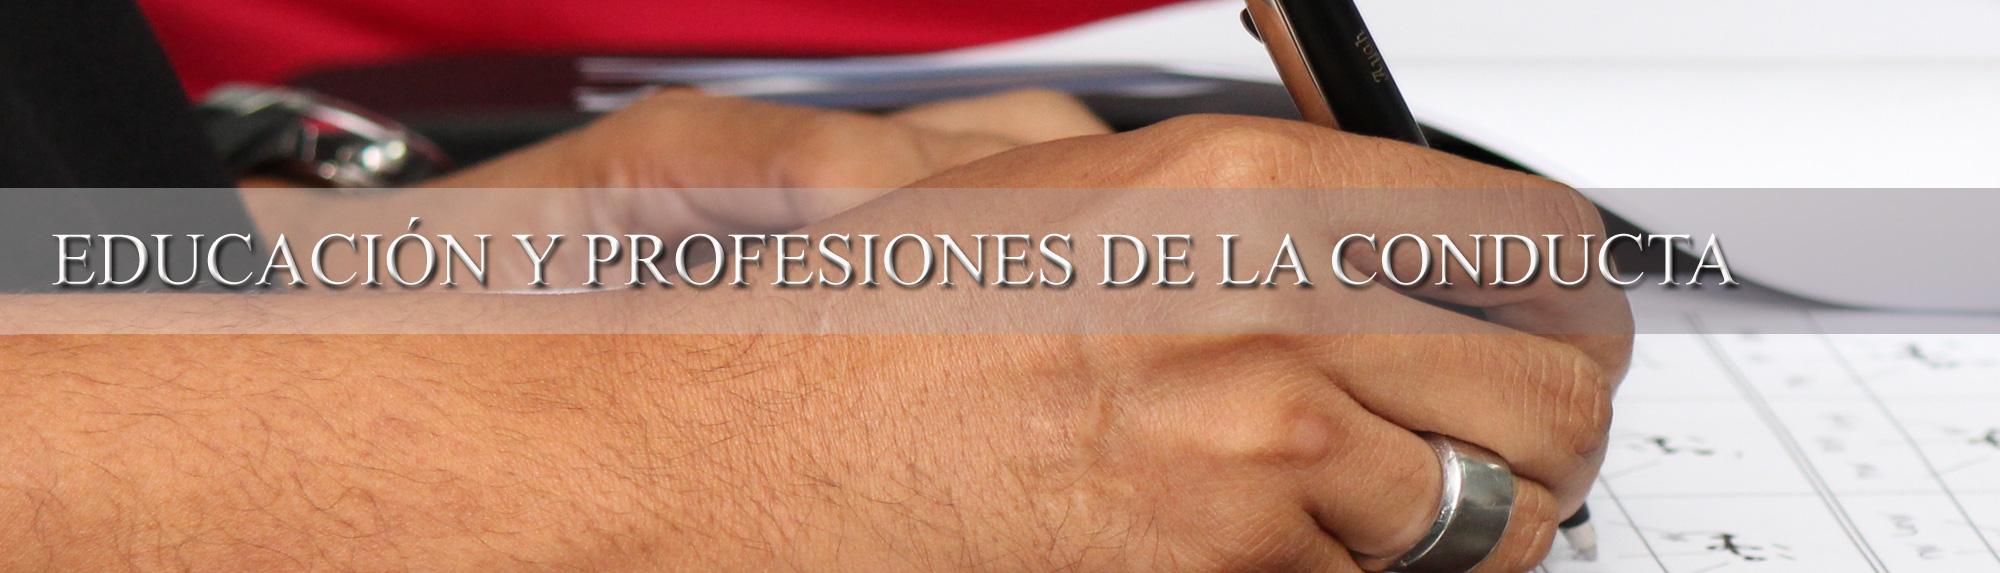 Colegios_Educa_template_Pag-2